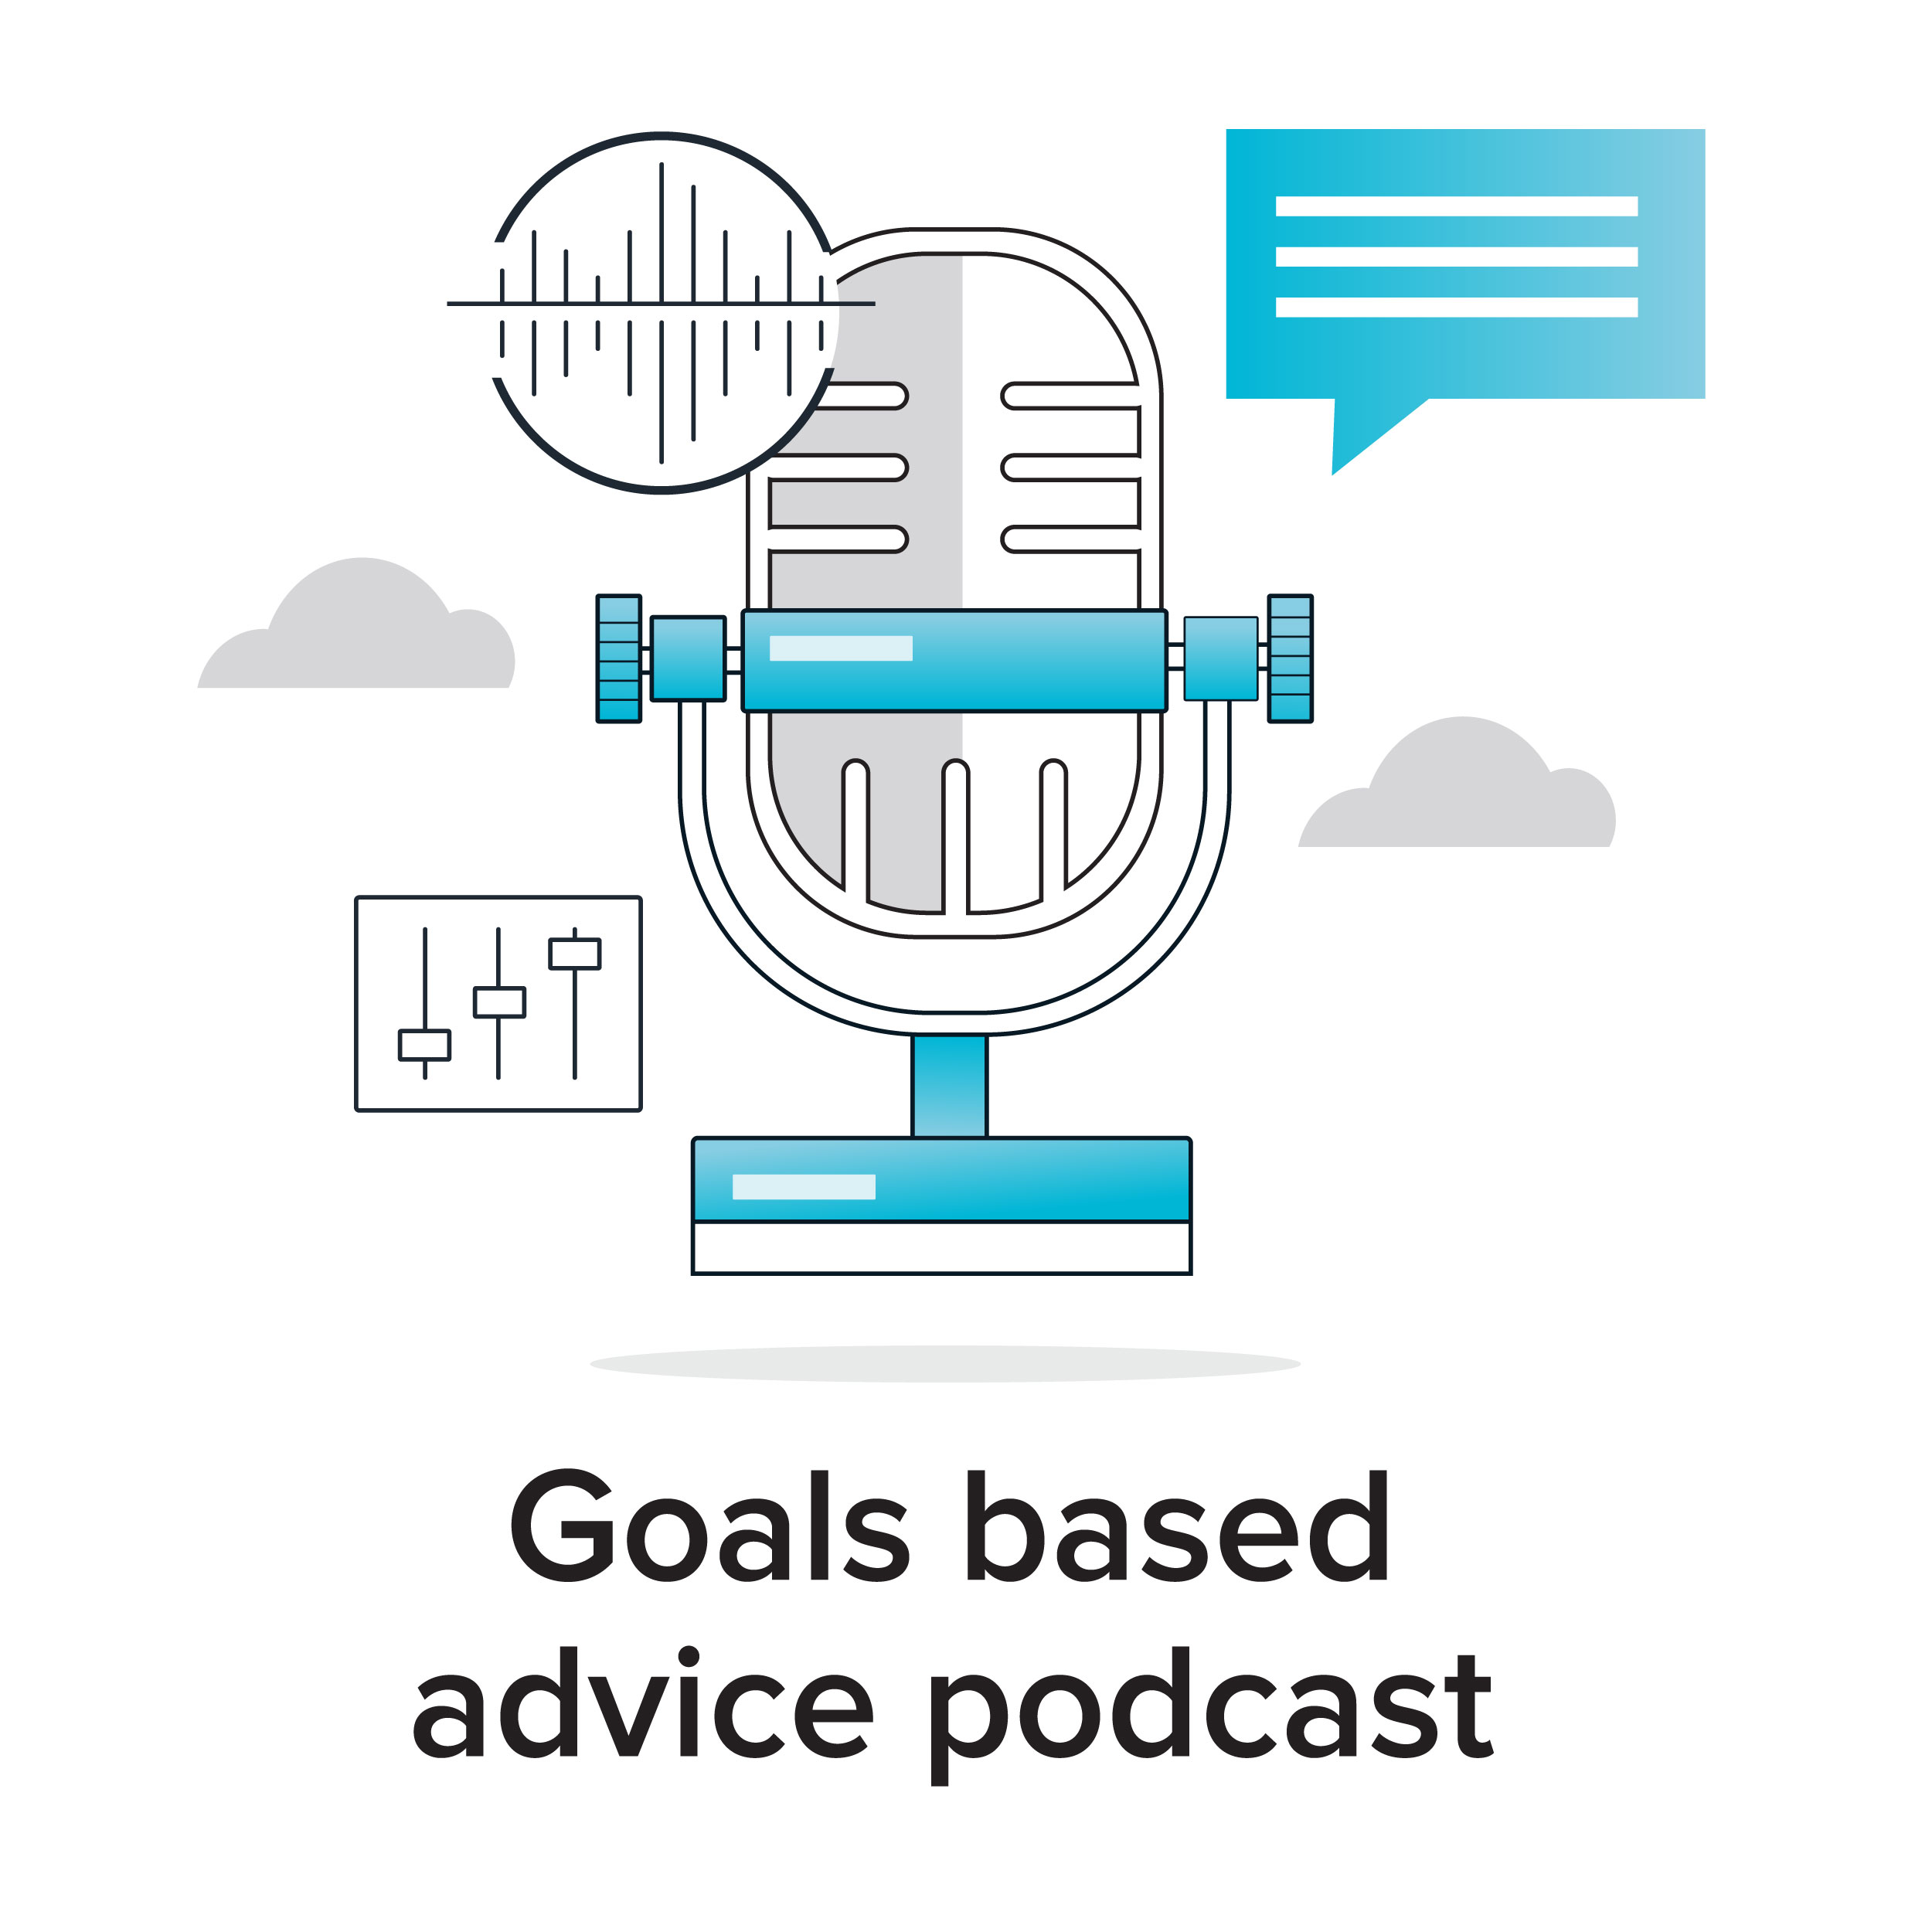 Goals Based Advice Podcast show art